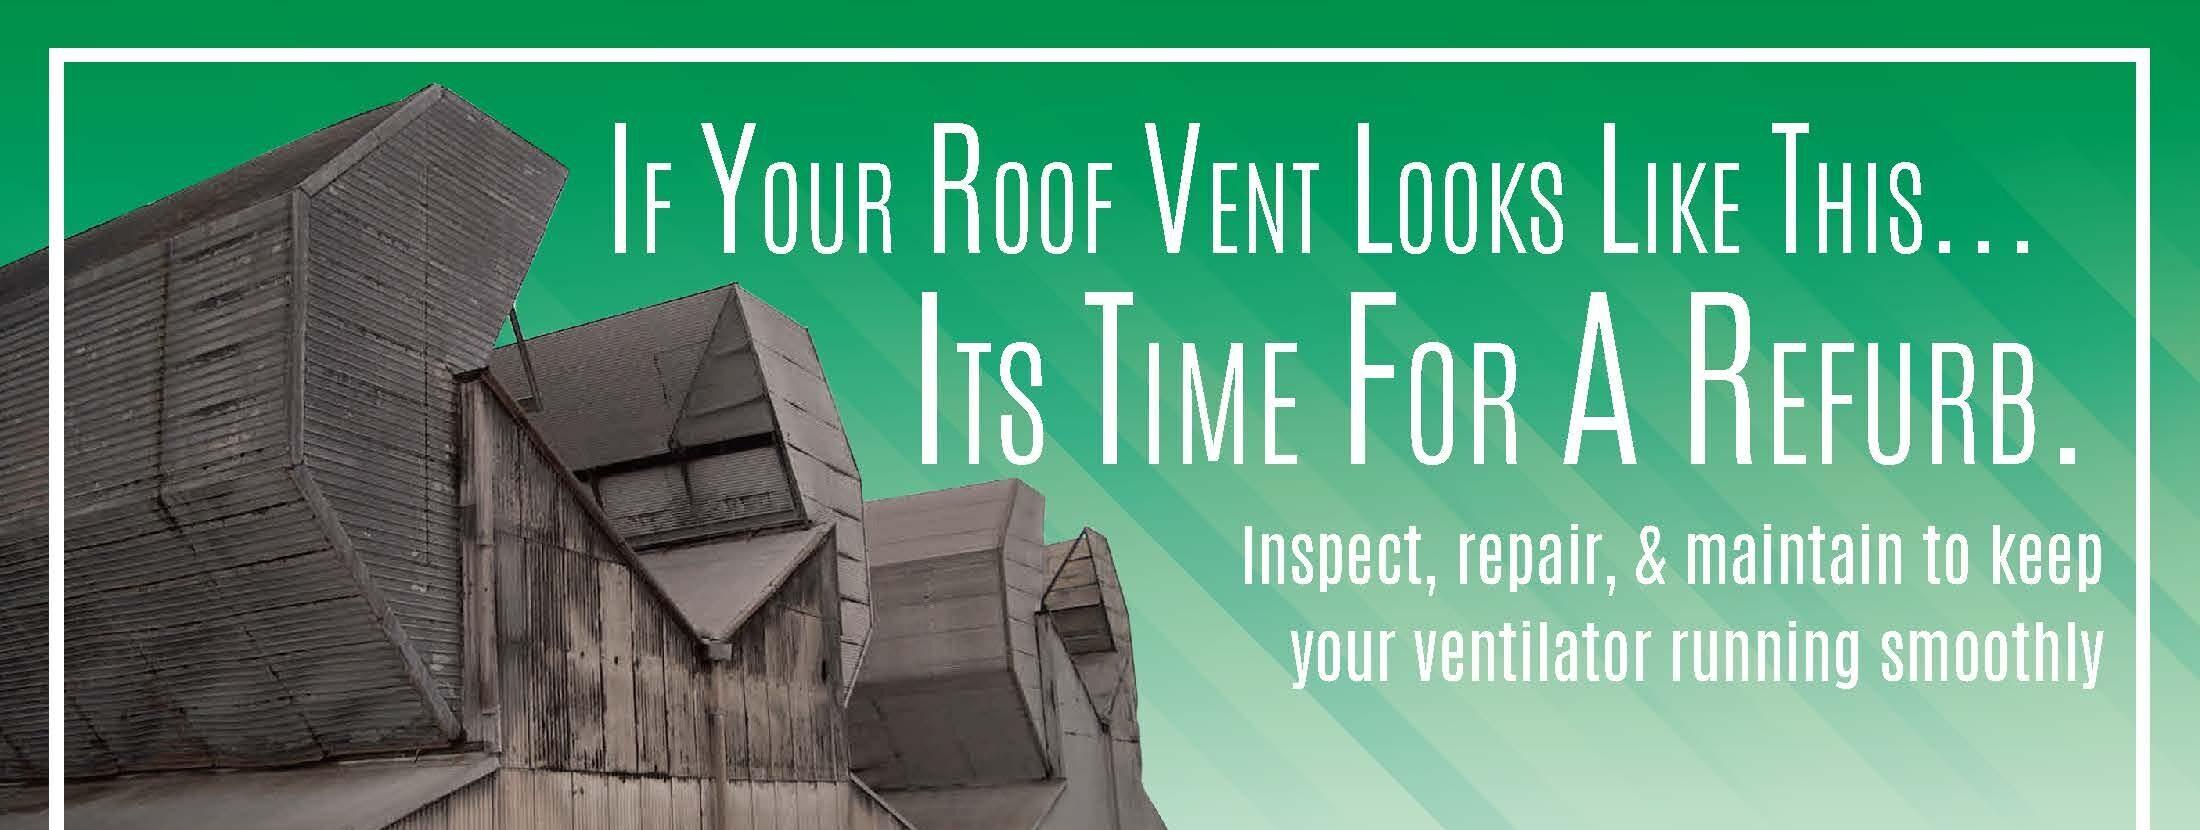 vent inspection image